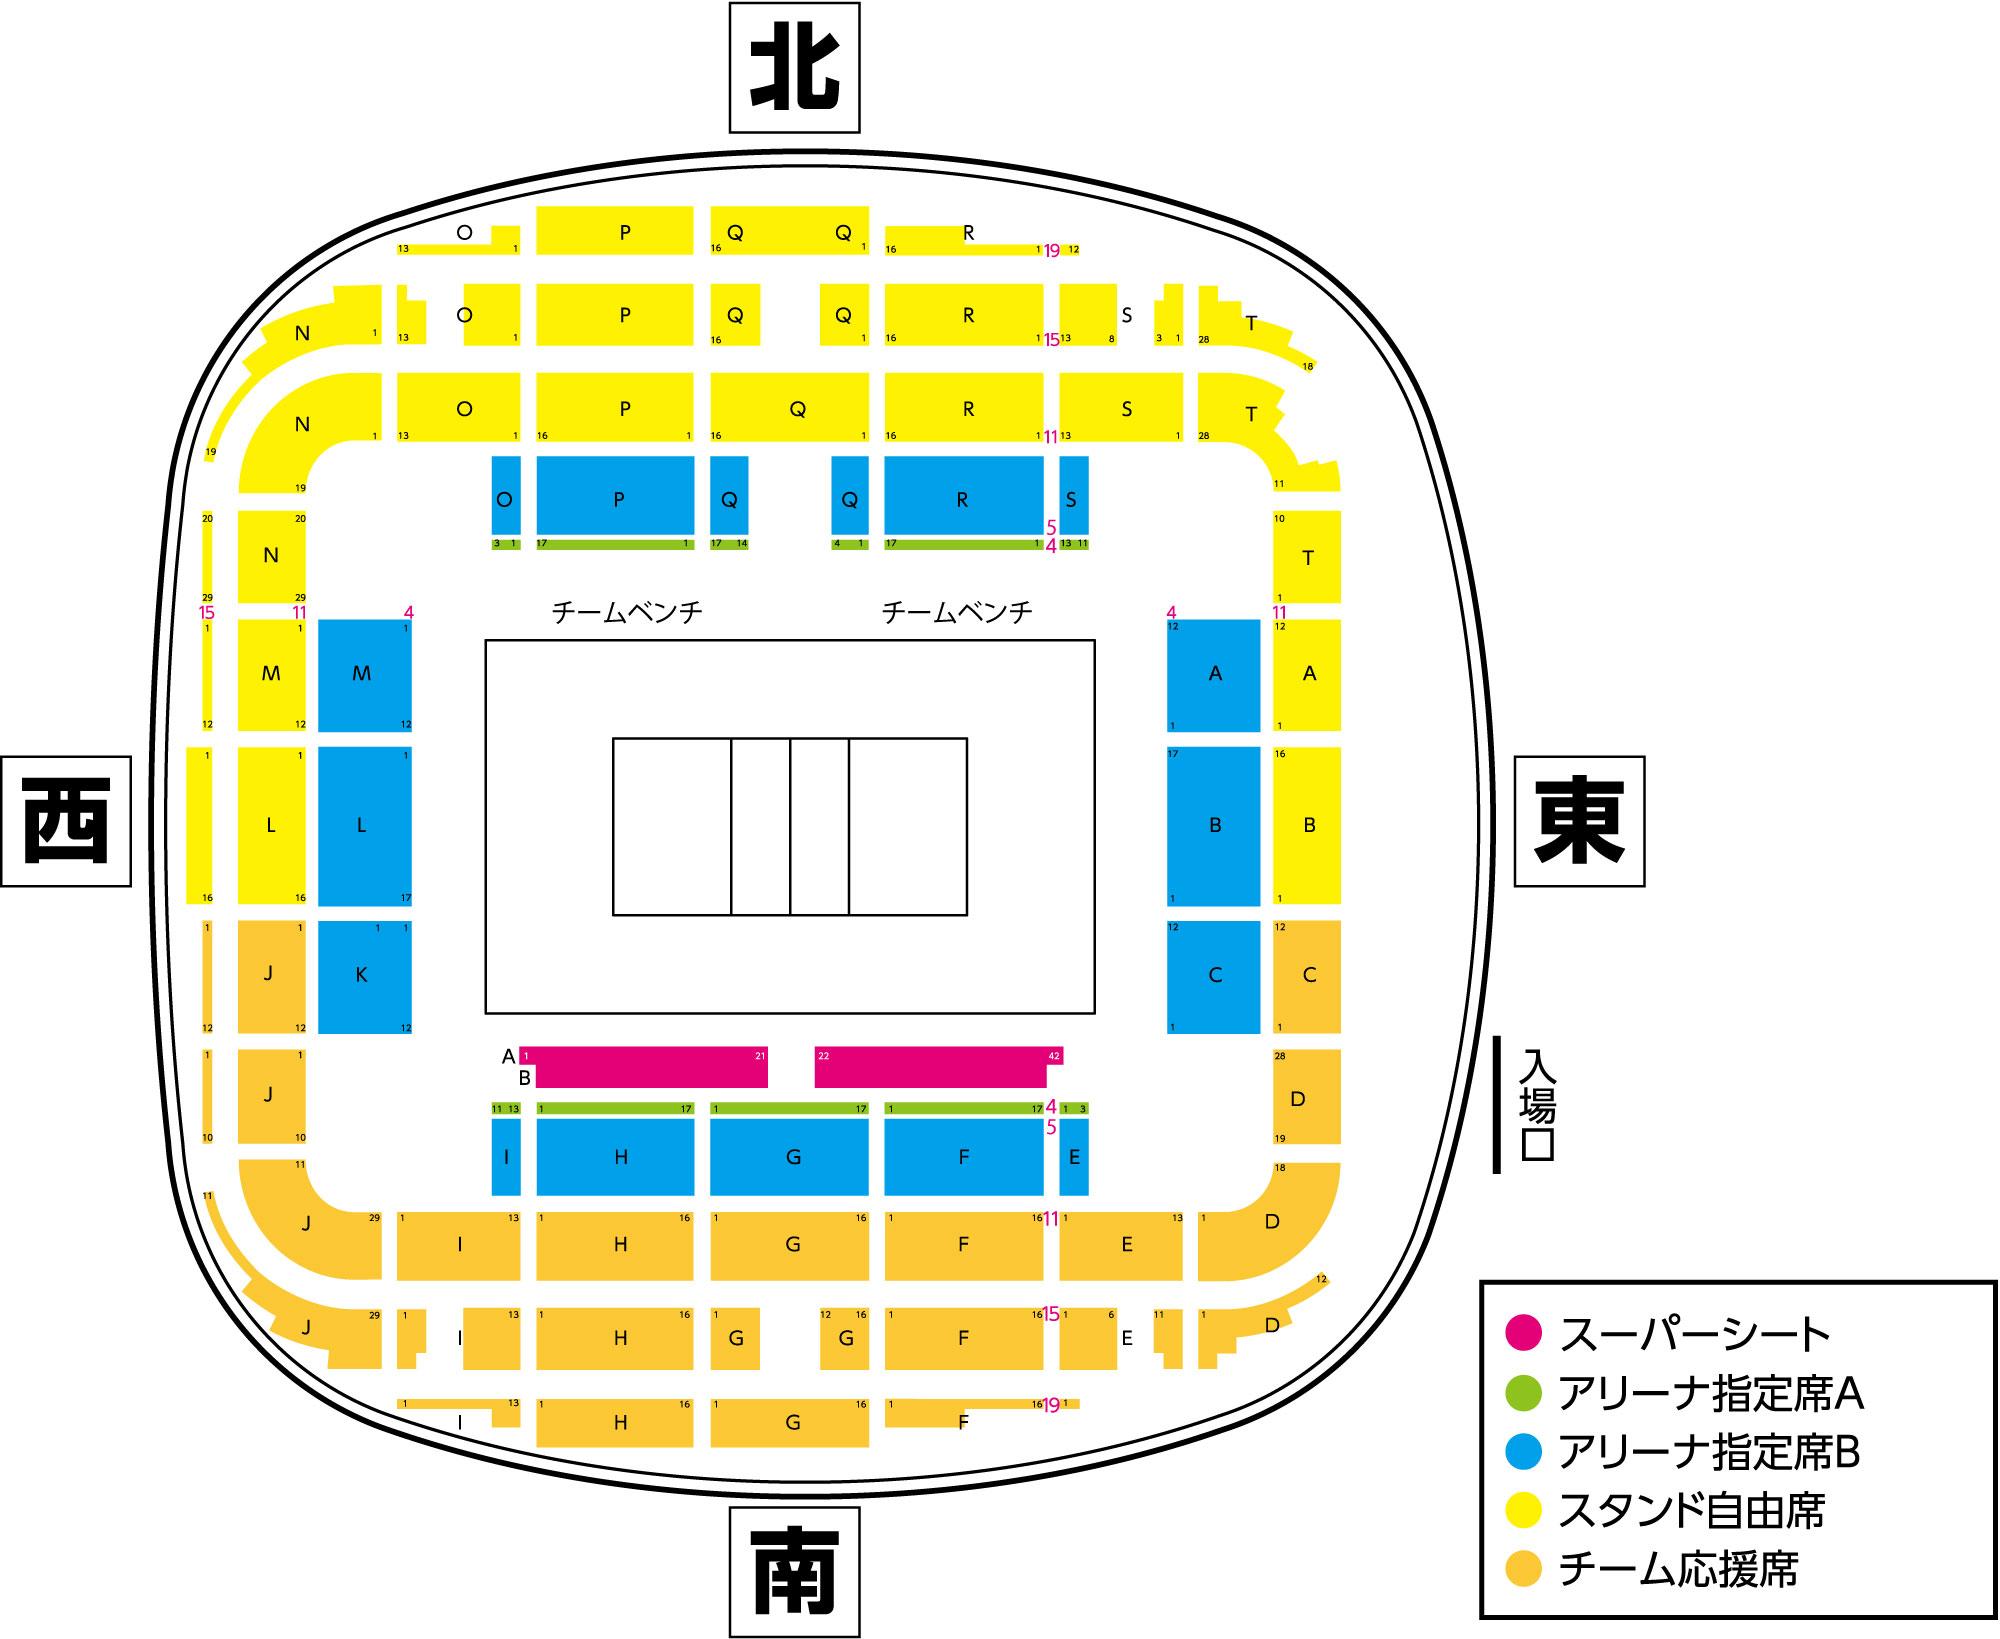 V・PL、CLⅠ男子大田大会 @ 大田区総合体育館 | 大田区 | 東京都 | 日本